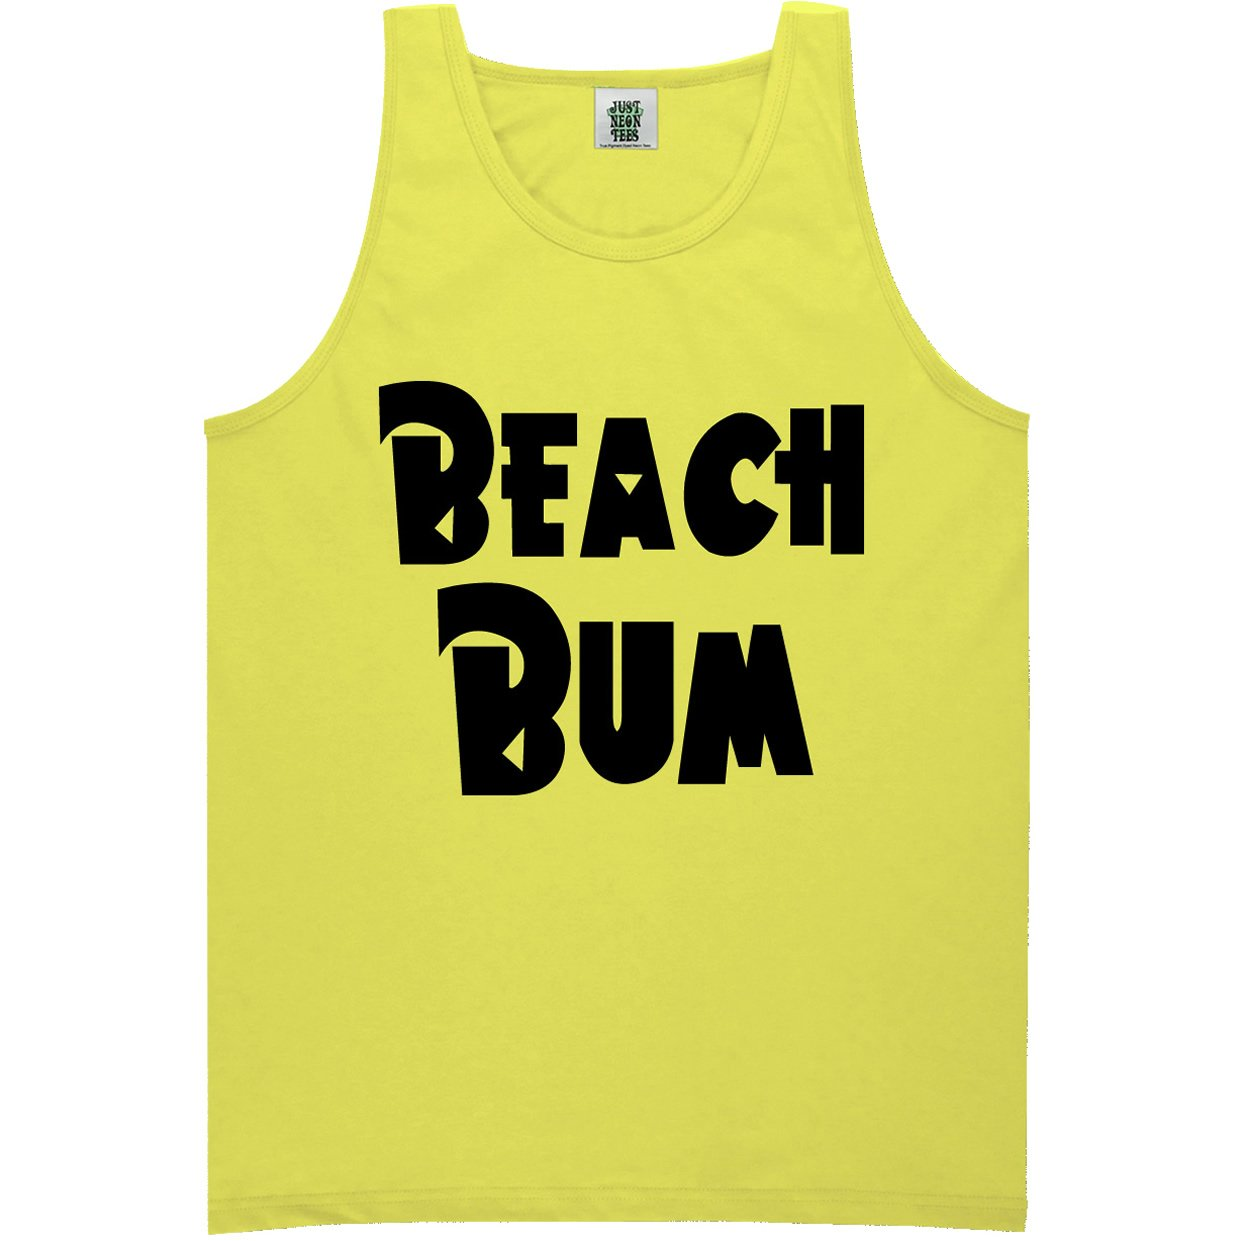 6 Bright Colors ZeroGravitee Youth Beach Bum Bright Neon Tank Top